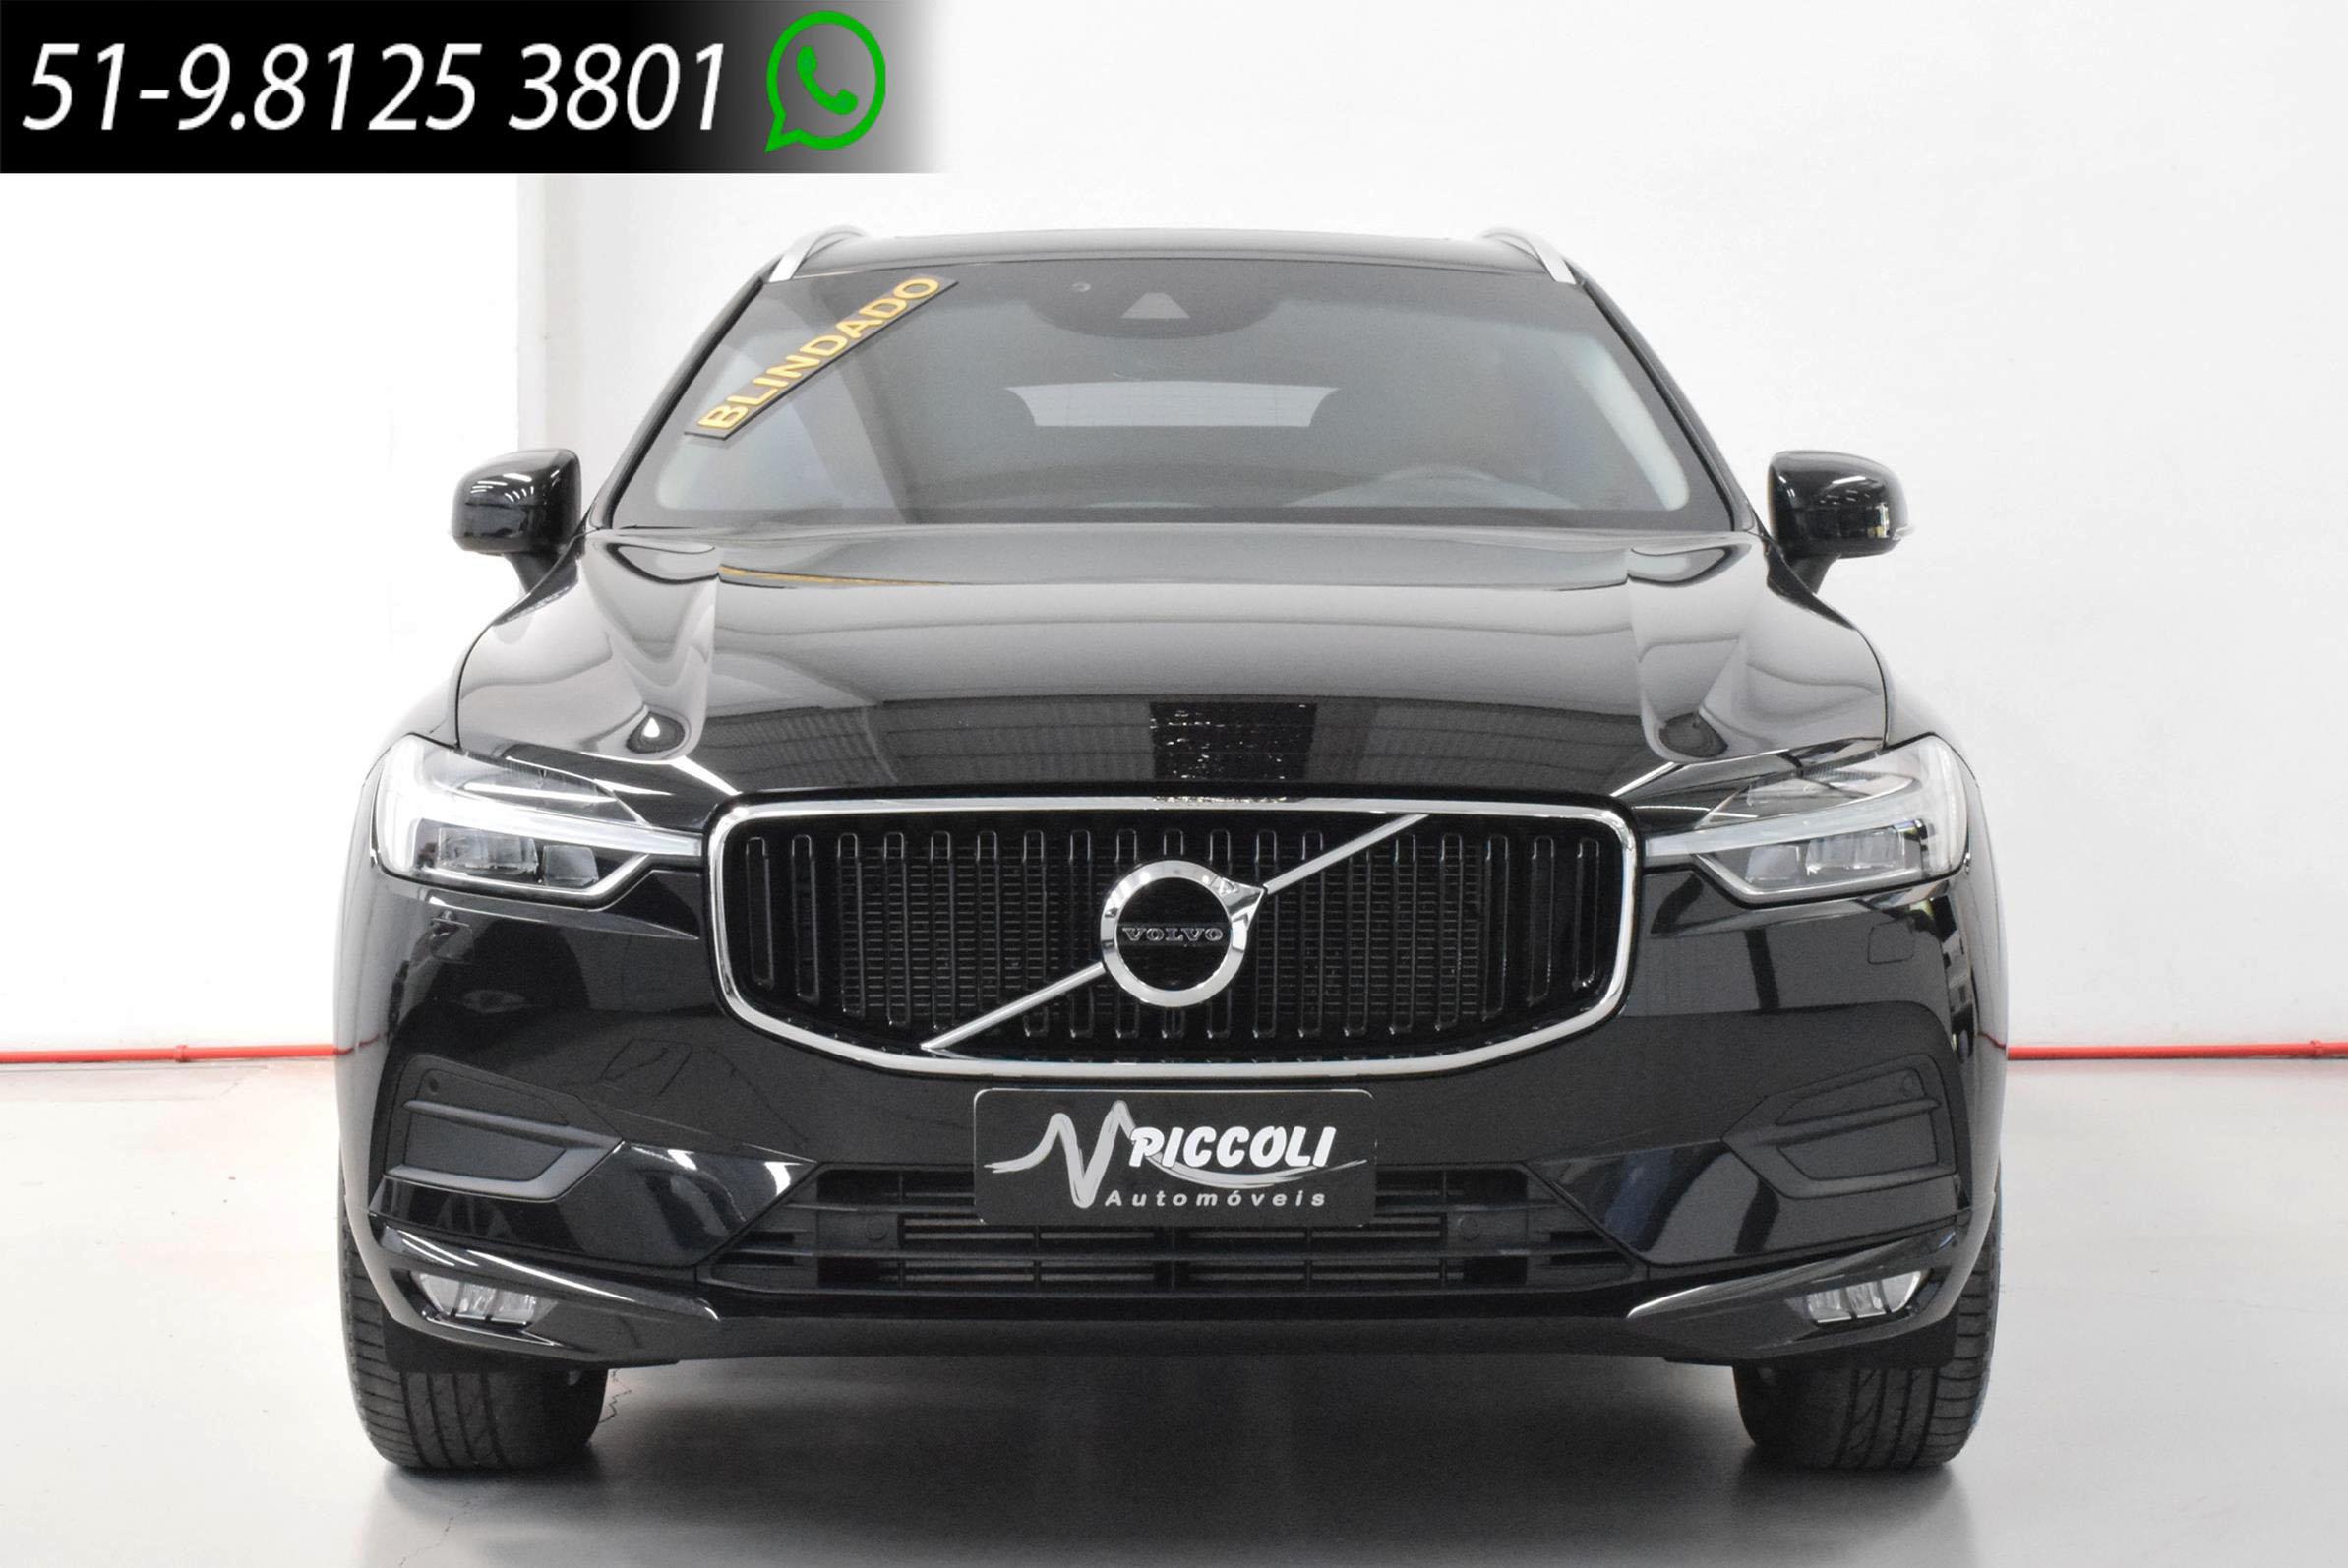 VOLVO - XC60 T5 MOMENTUM BLINDADA - 2018/2018 - PRETA - R$ 249.900,00